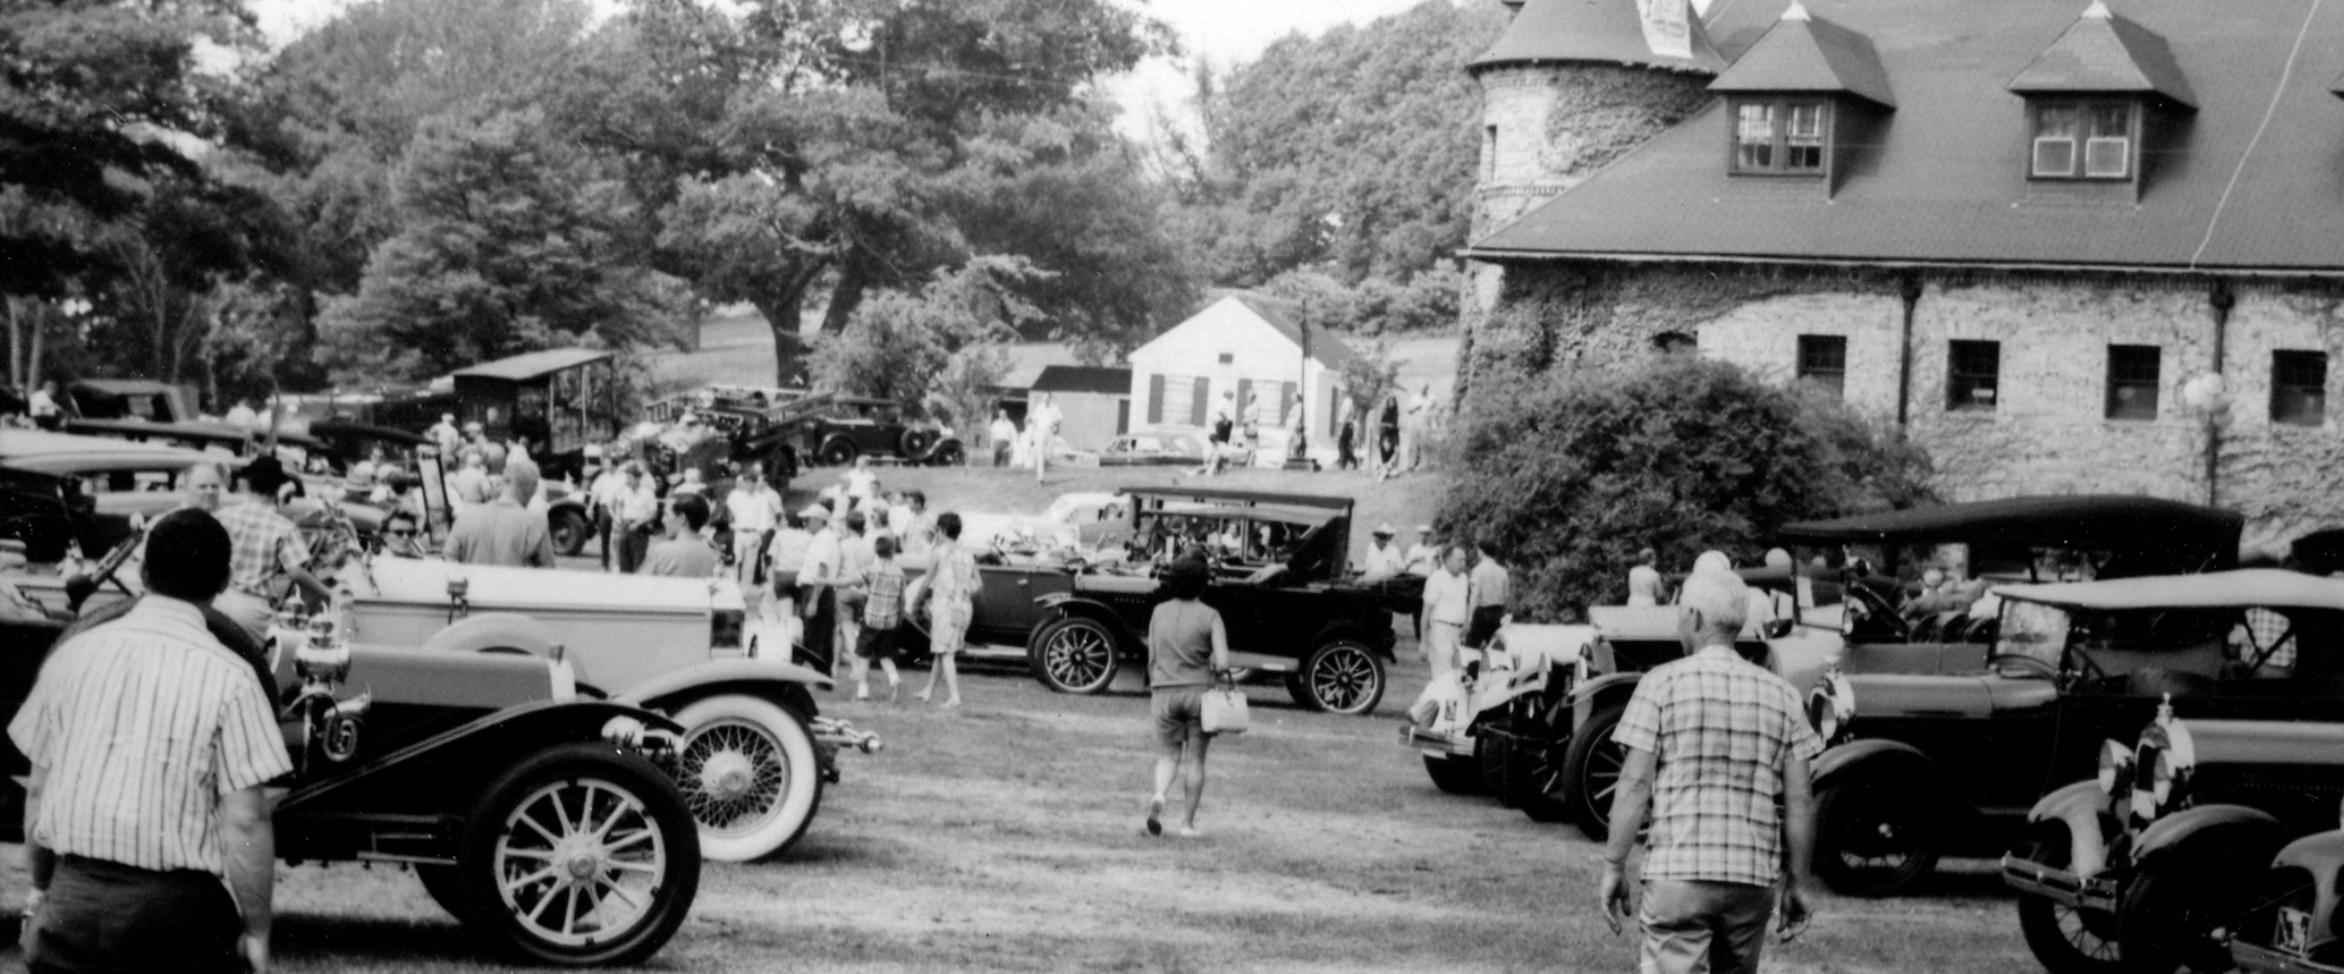 Larz Anderson Auto Museum, Brookline MA